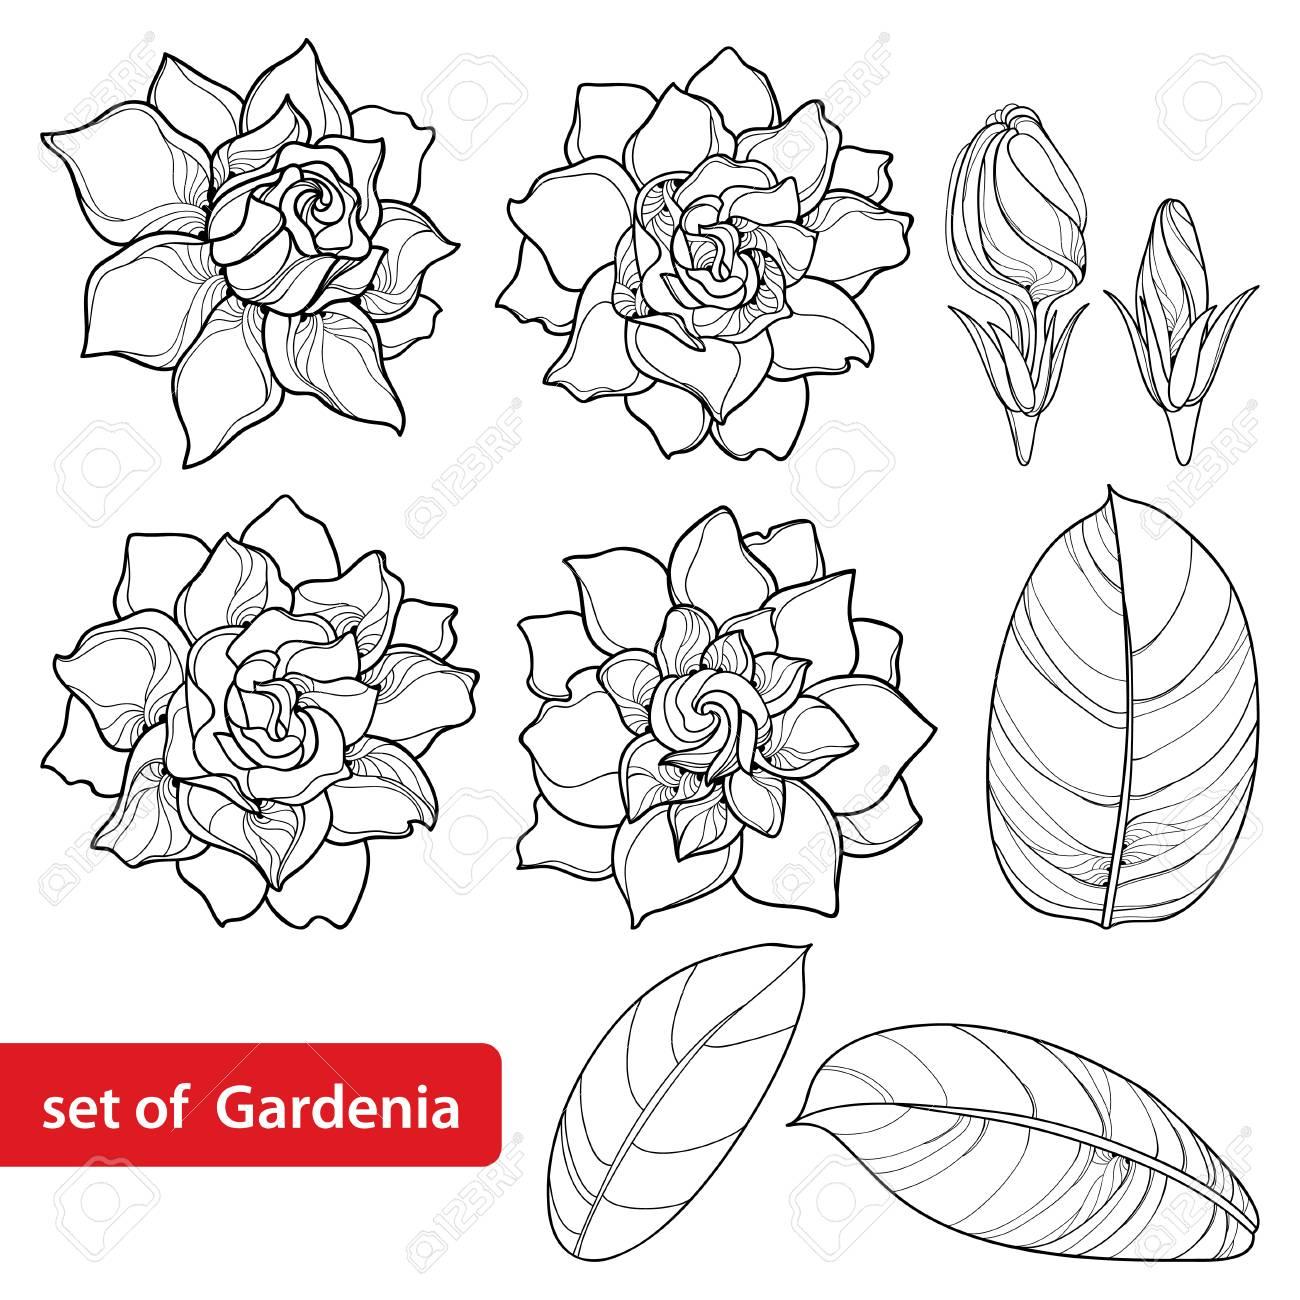 Gardenias In 2020 Gardenia Tattoo Flower Drawing Gardenia